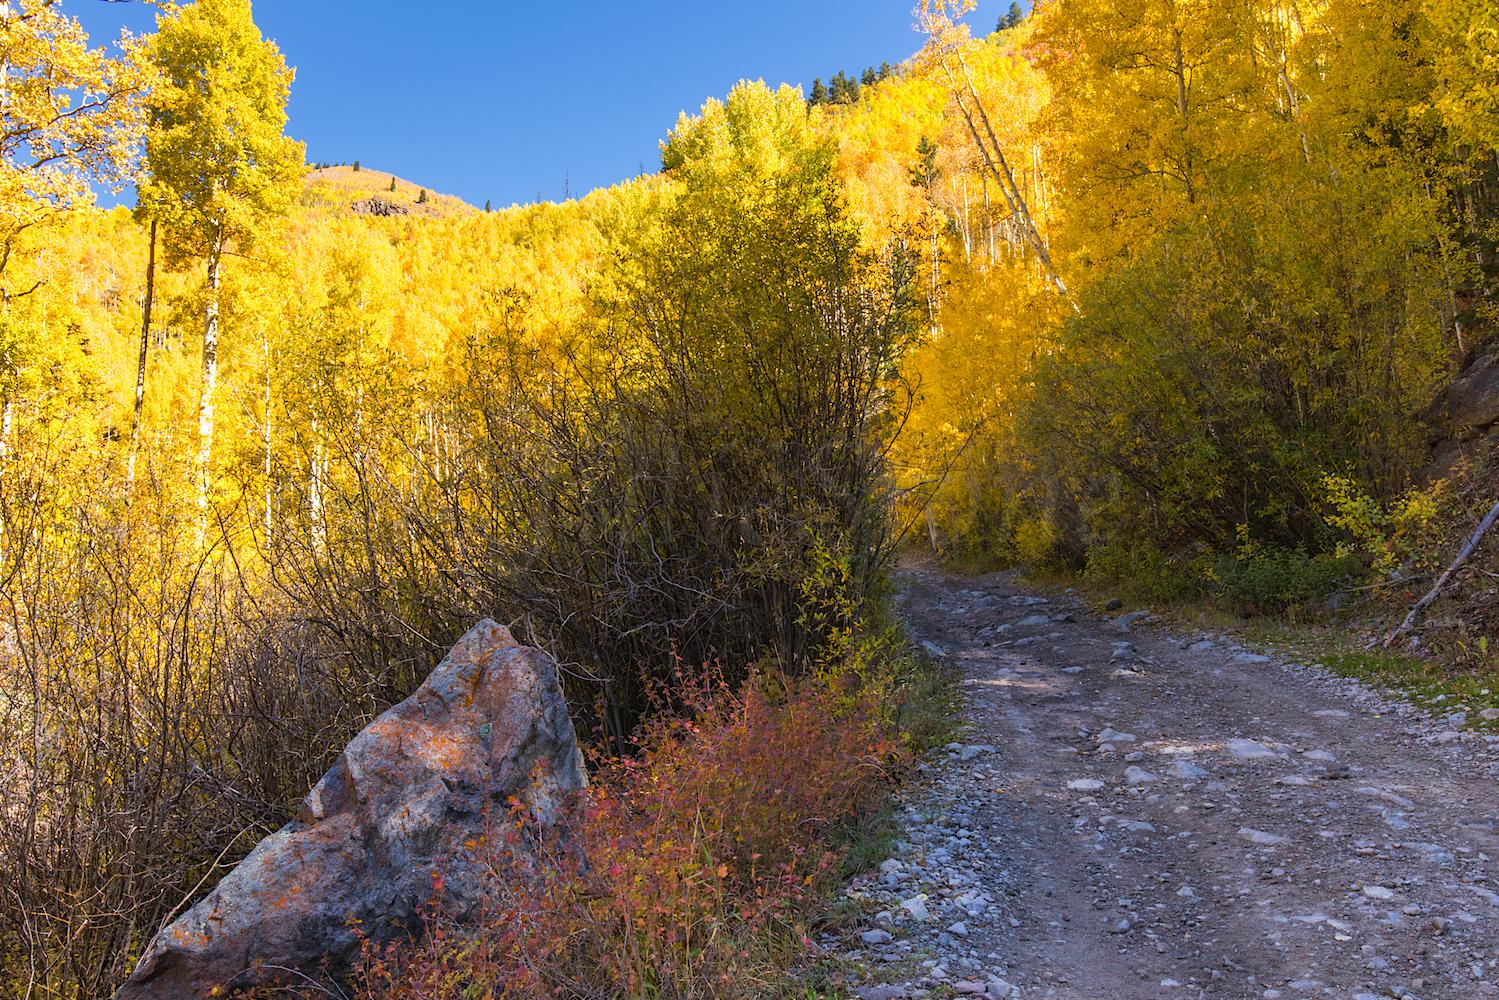 Nellie Creek Road, Image # 5212